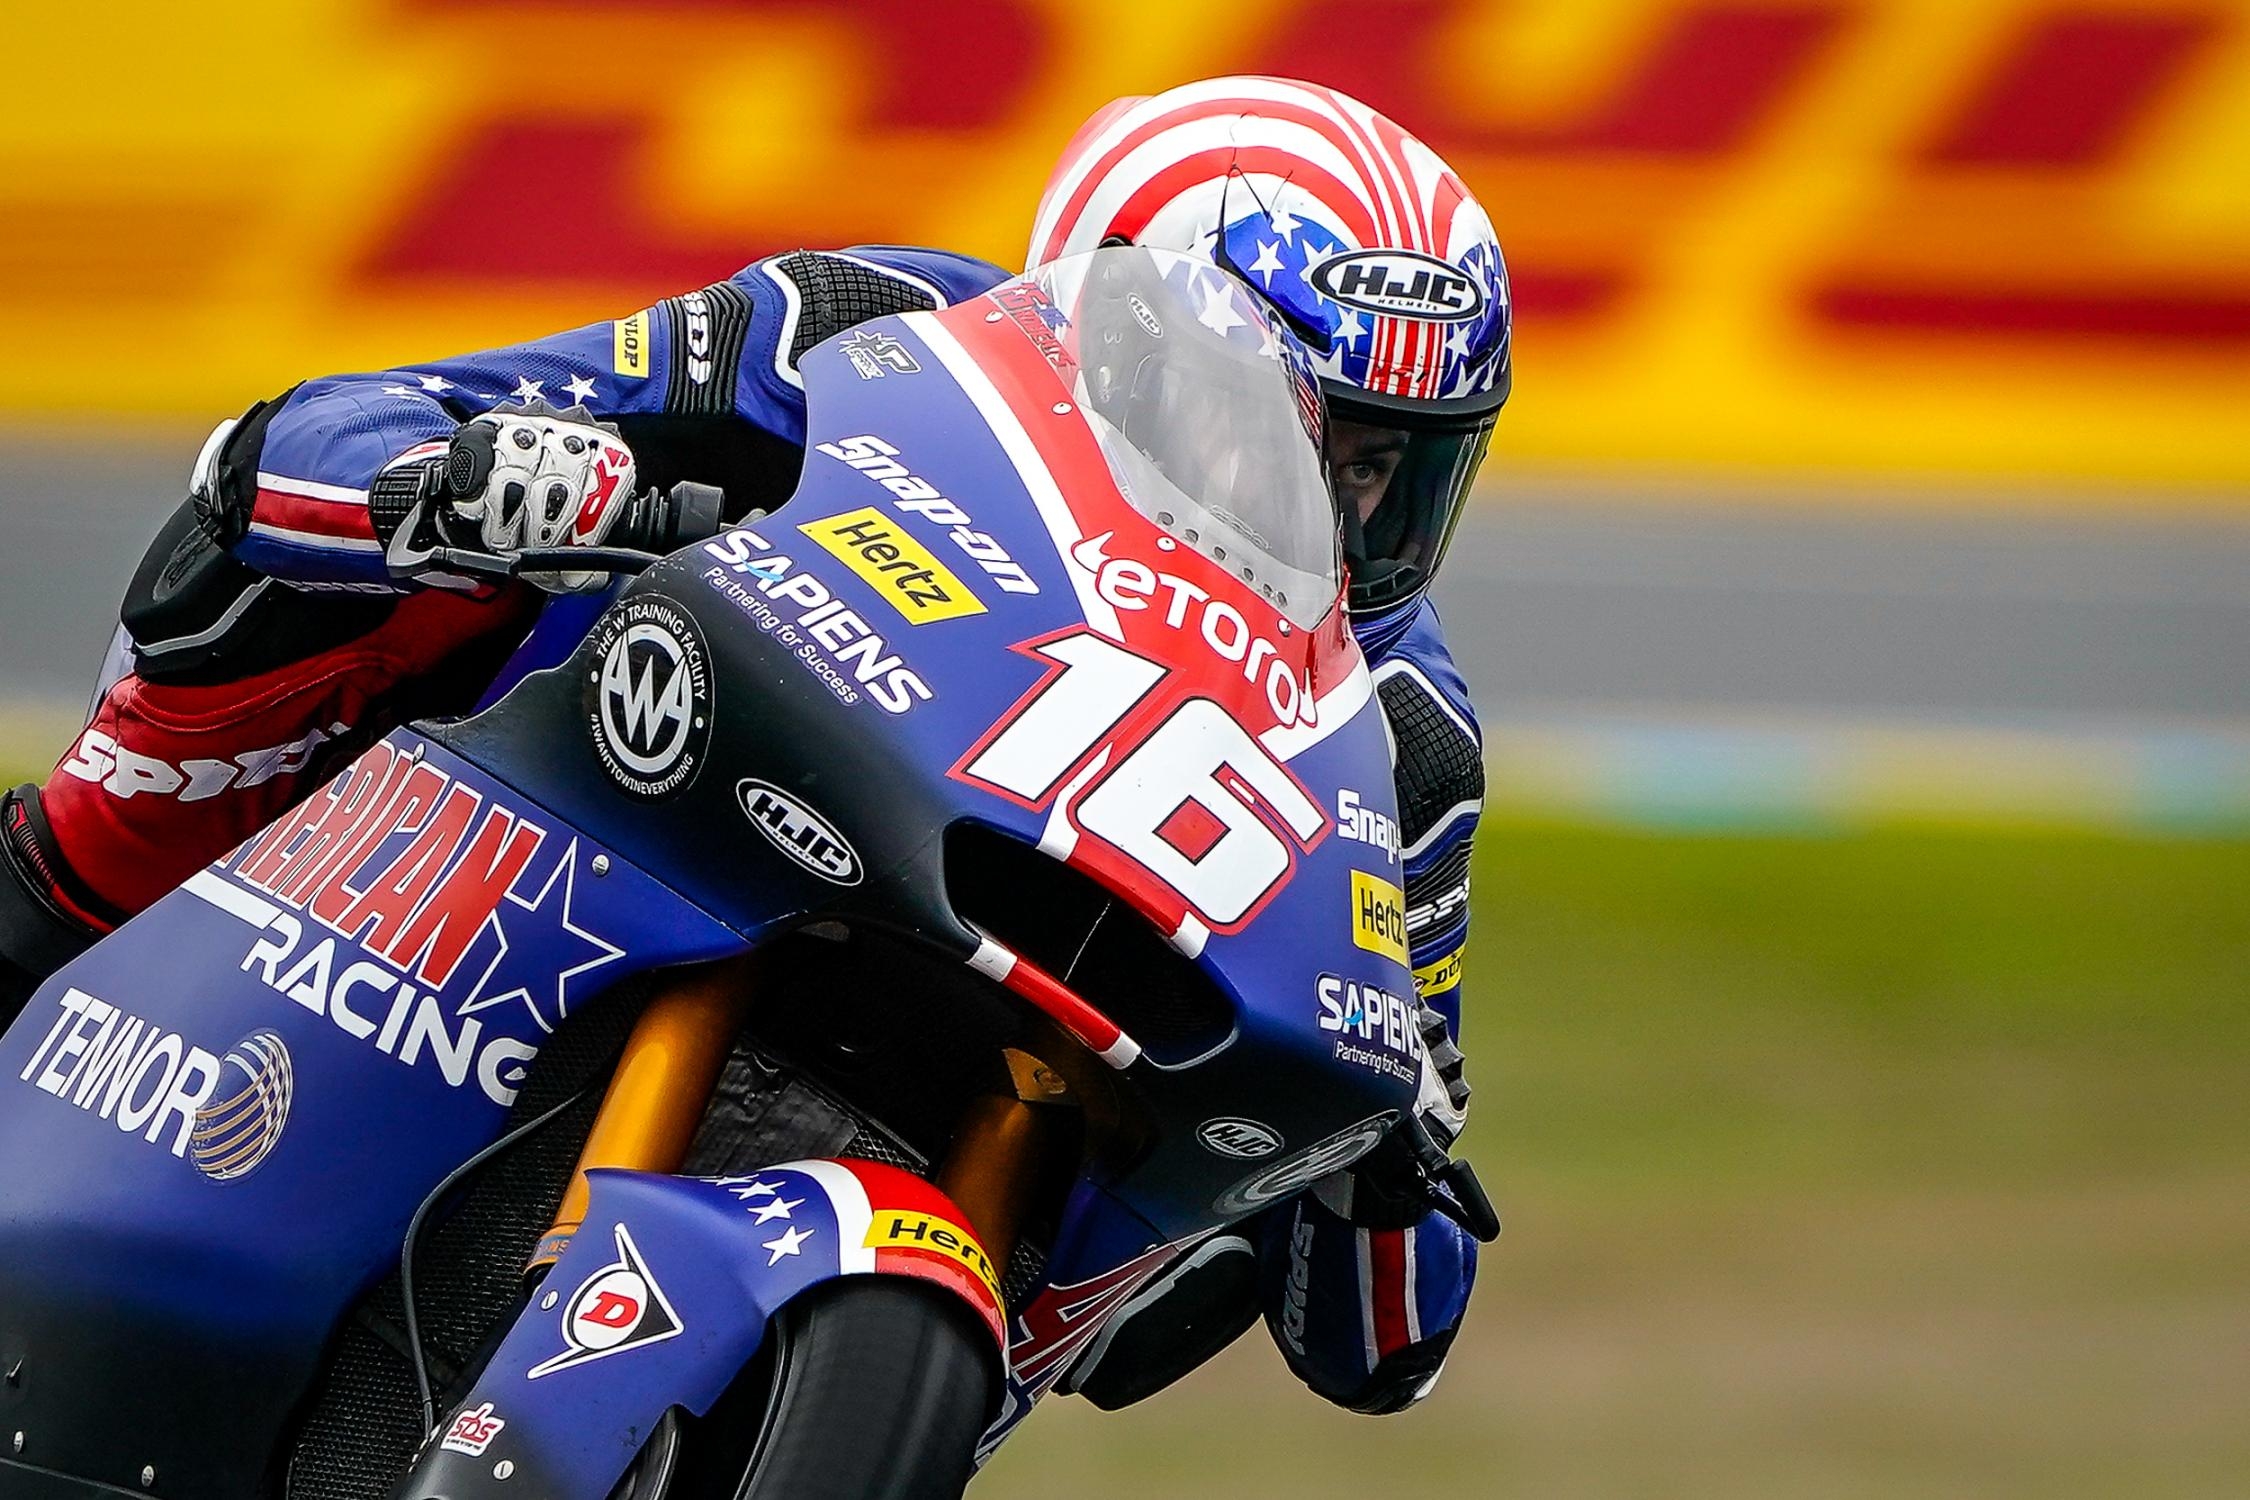 Gp Francia: Moto 2, brutta caduta per Luca Marini